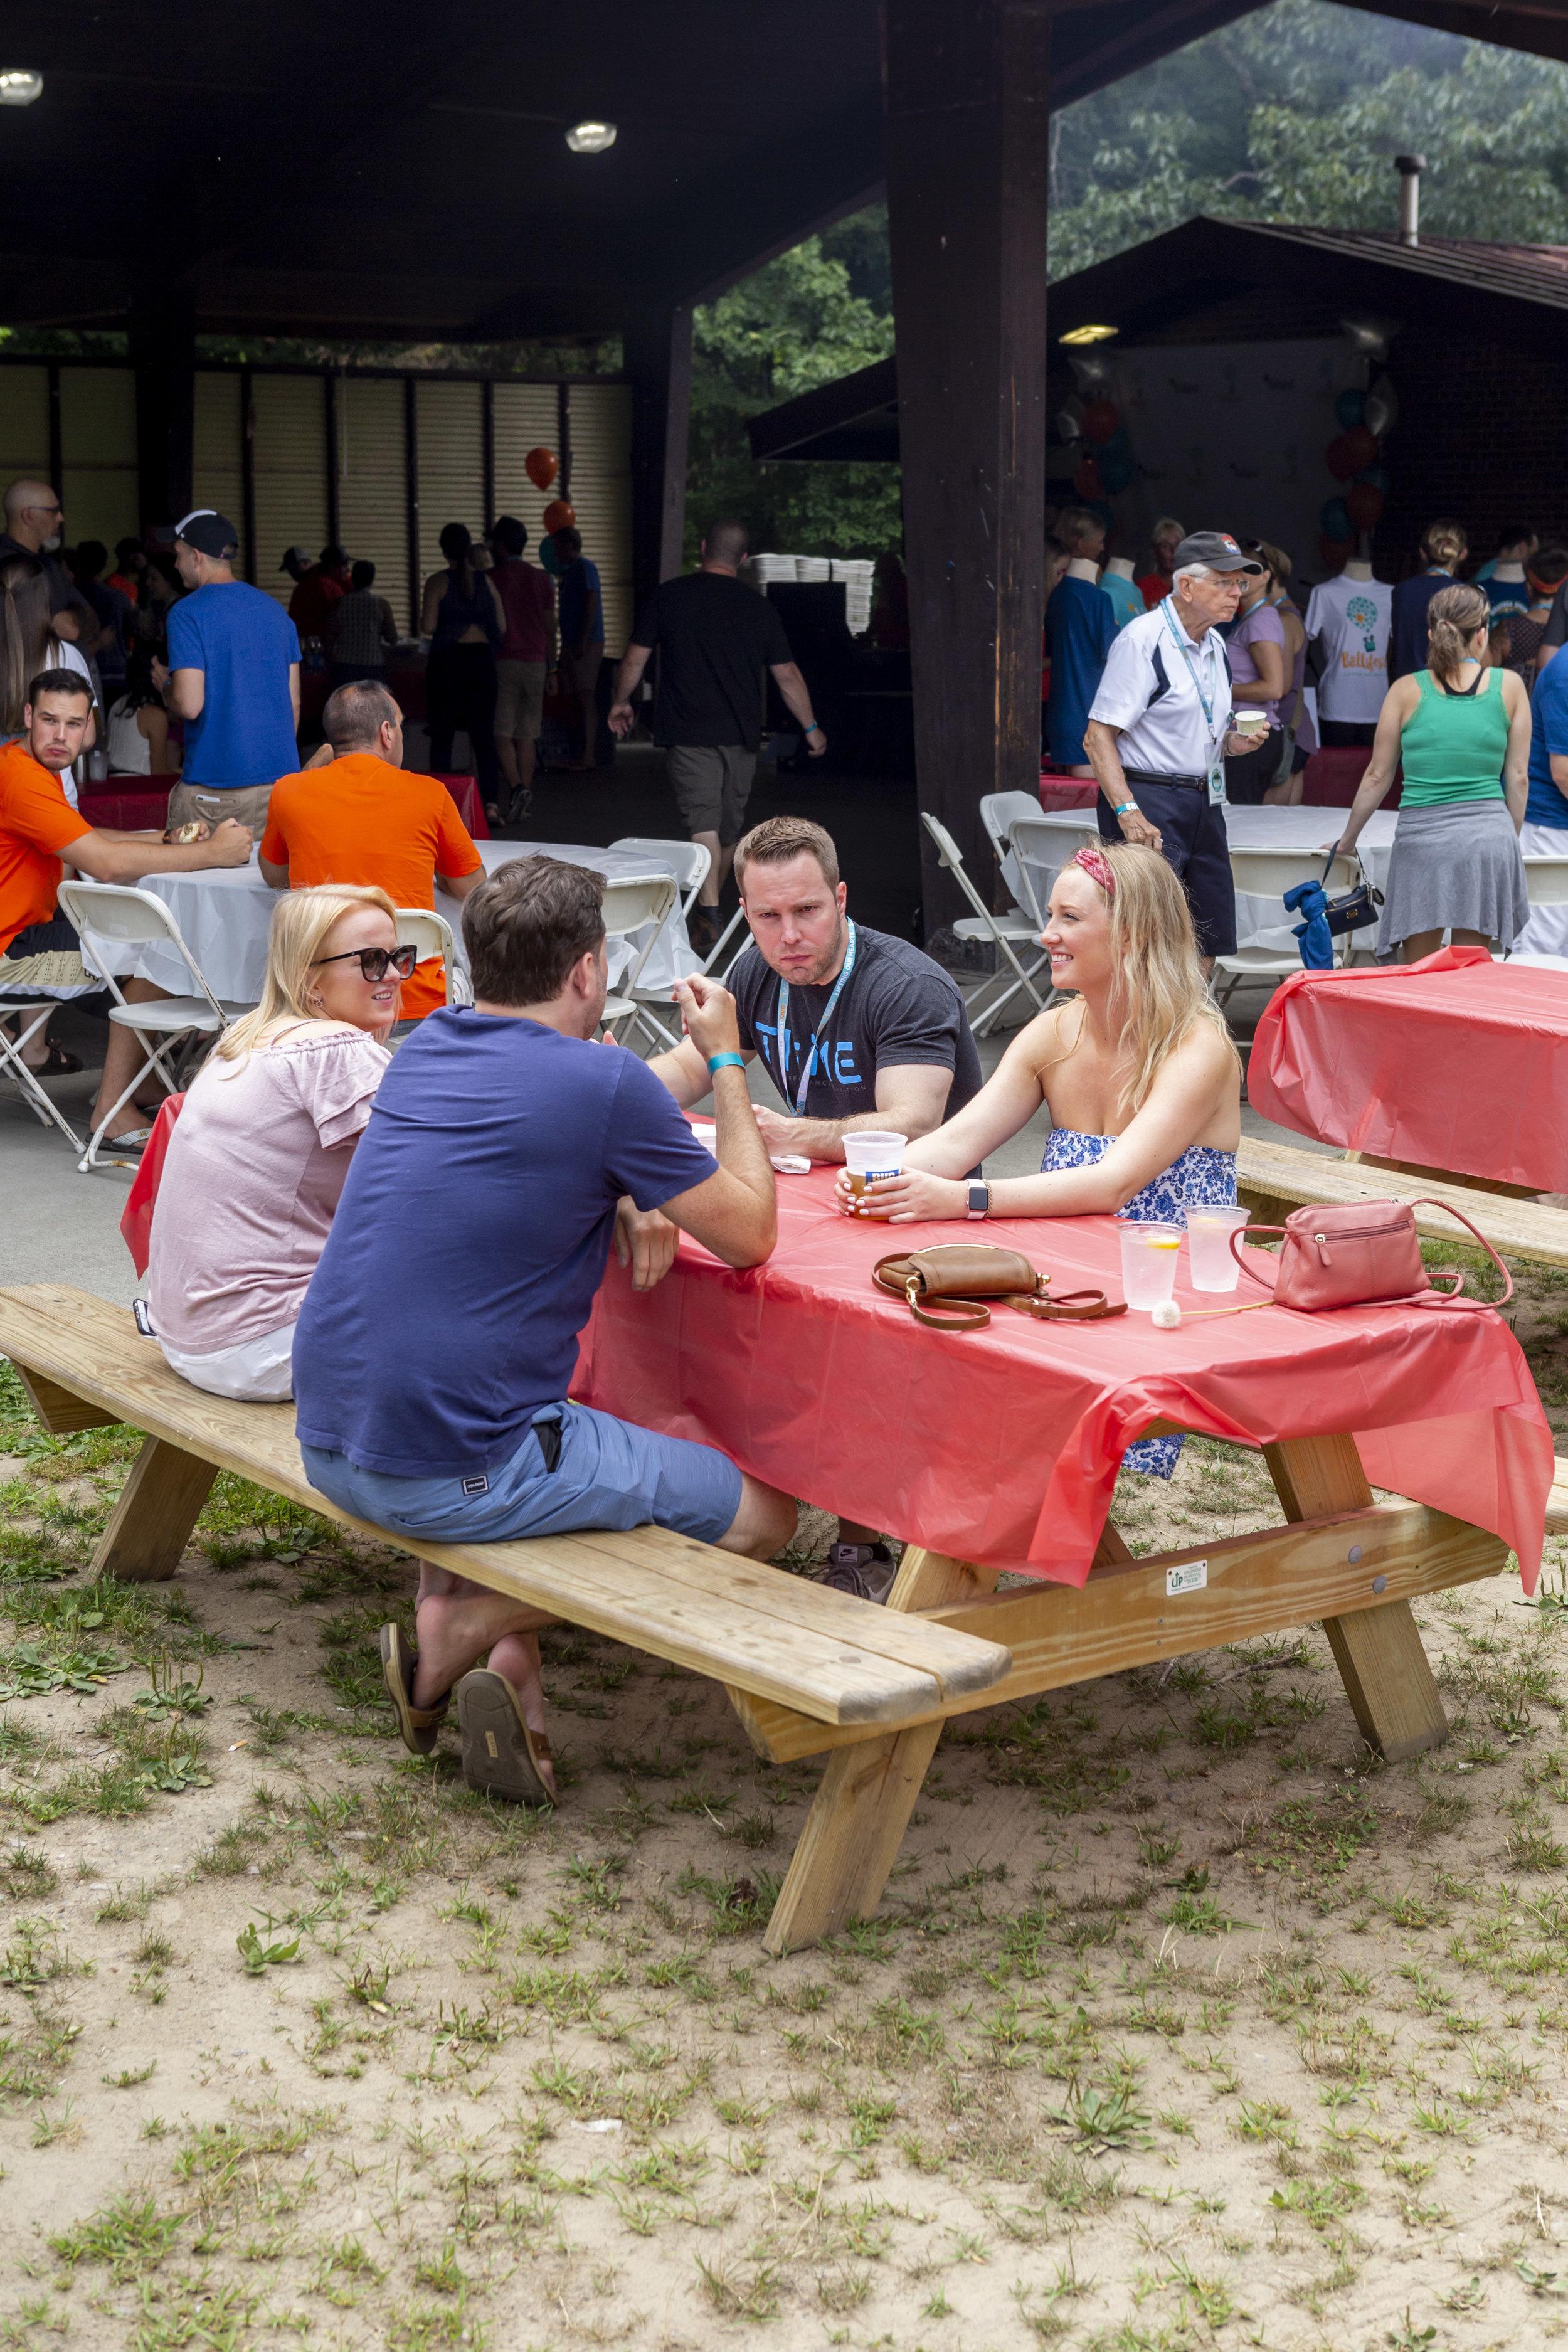 (2018.07.14) Ballsfest Saratoga Spa State Park-3532.jpg